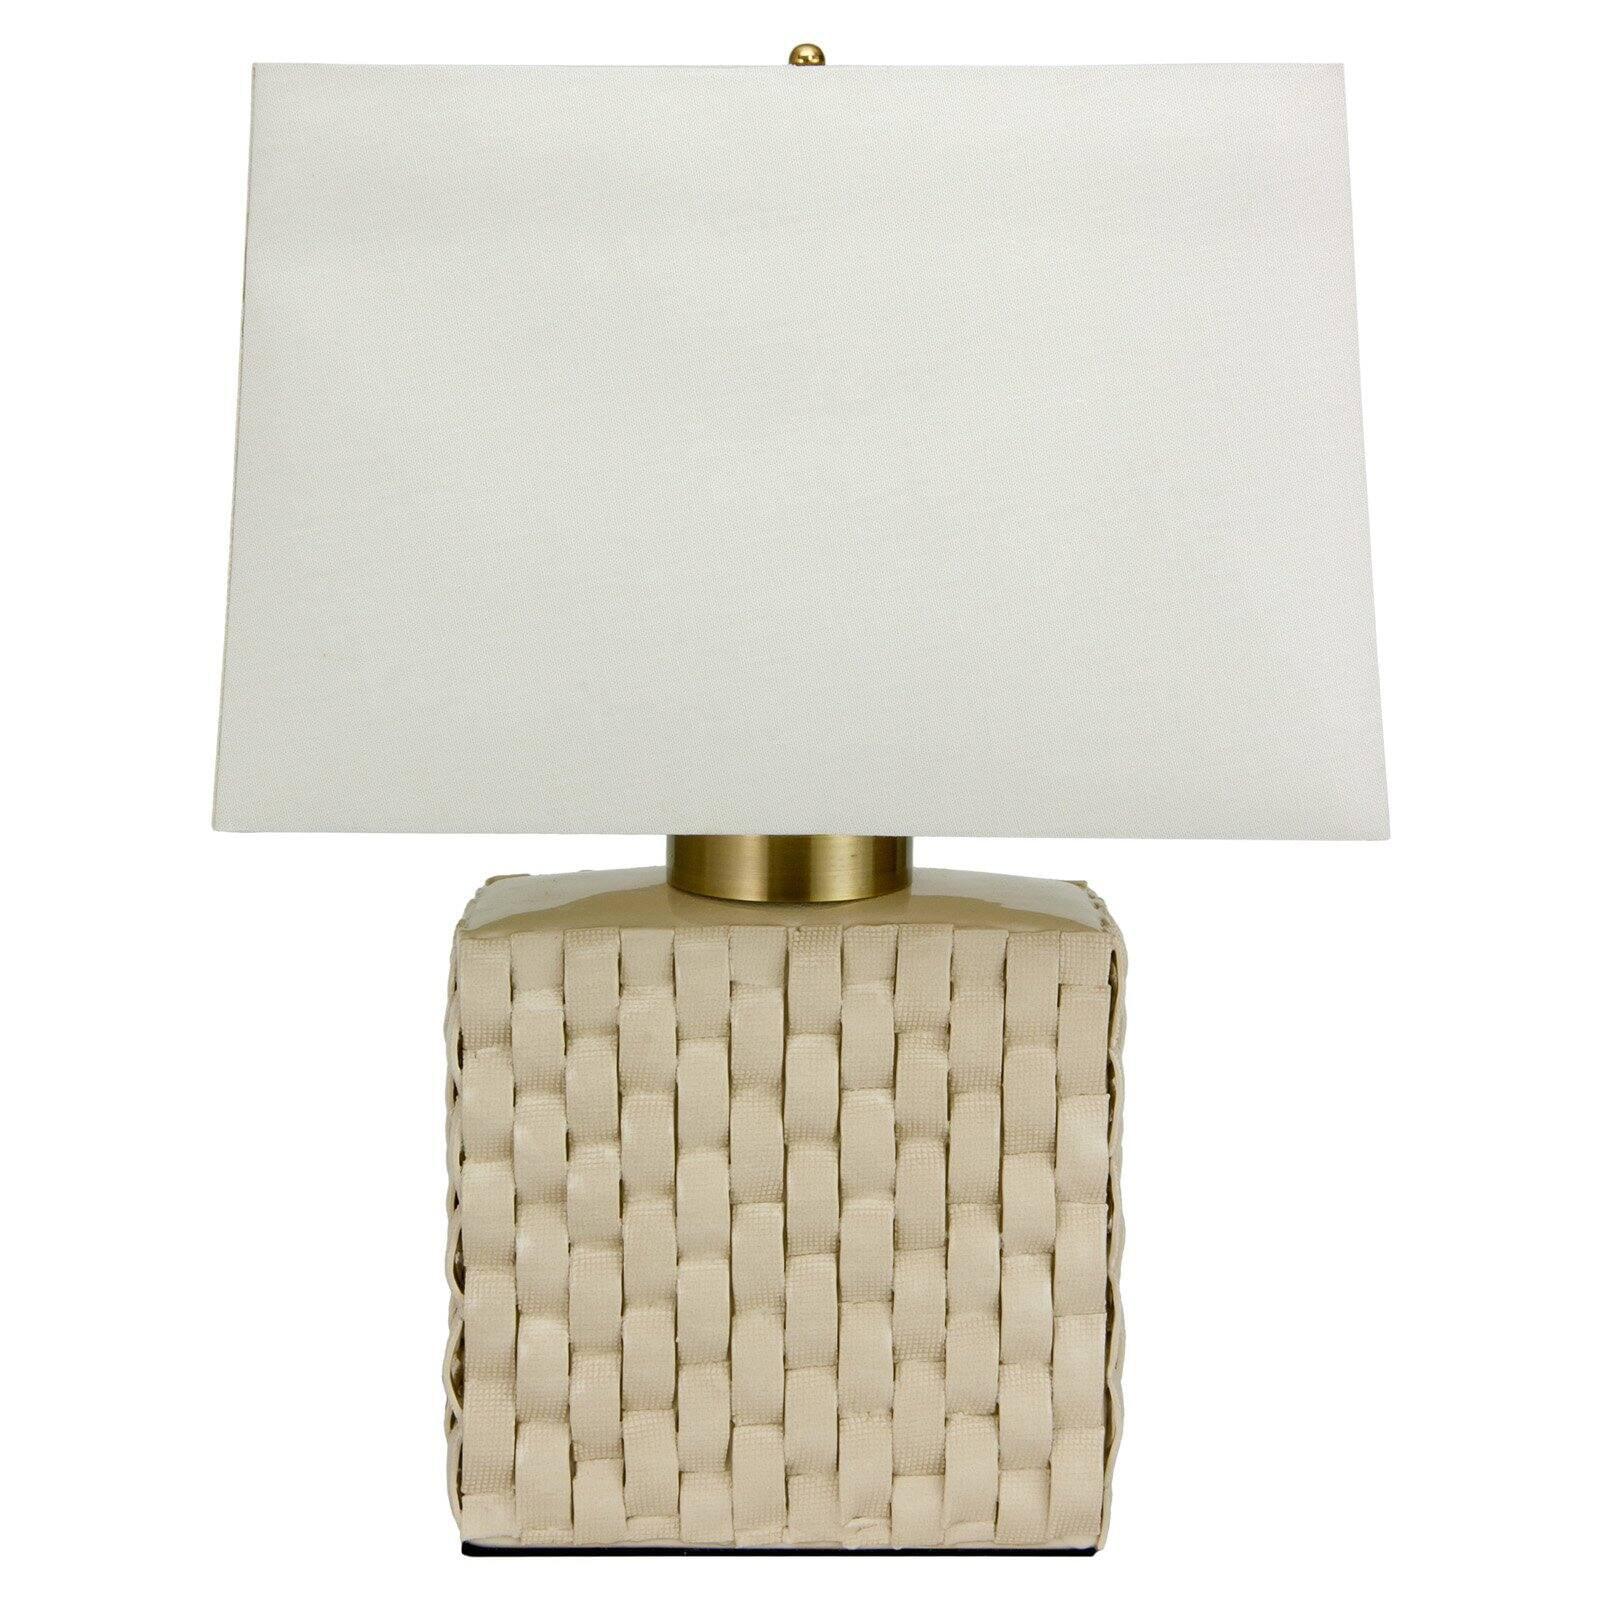 Oriental Furniture Basket Weave Cream Porcelain Jar Table Lamp